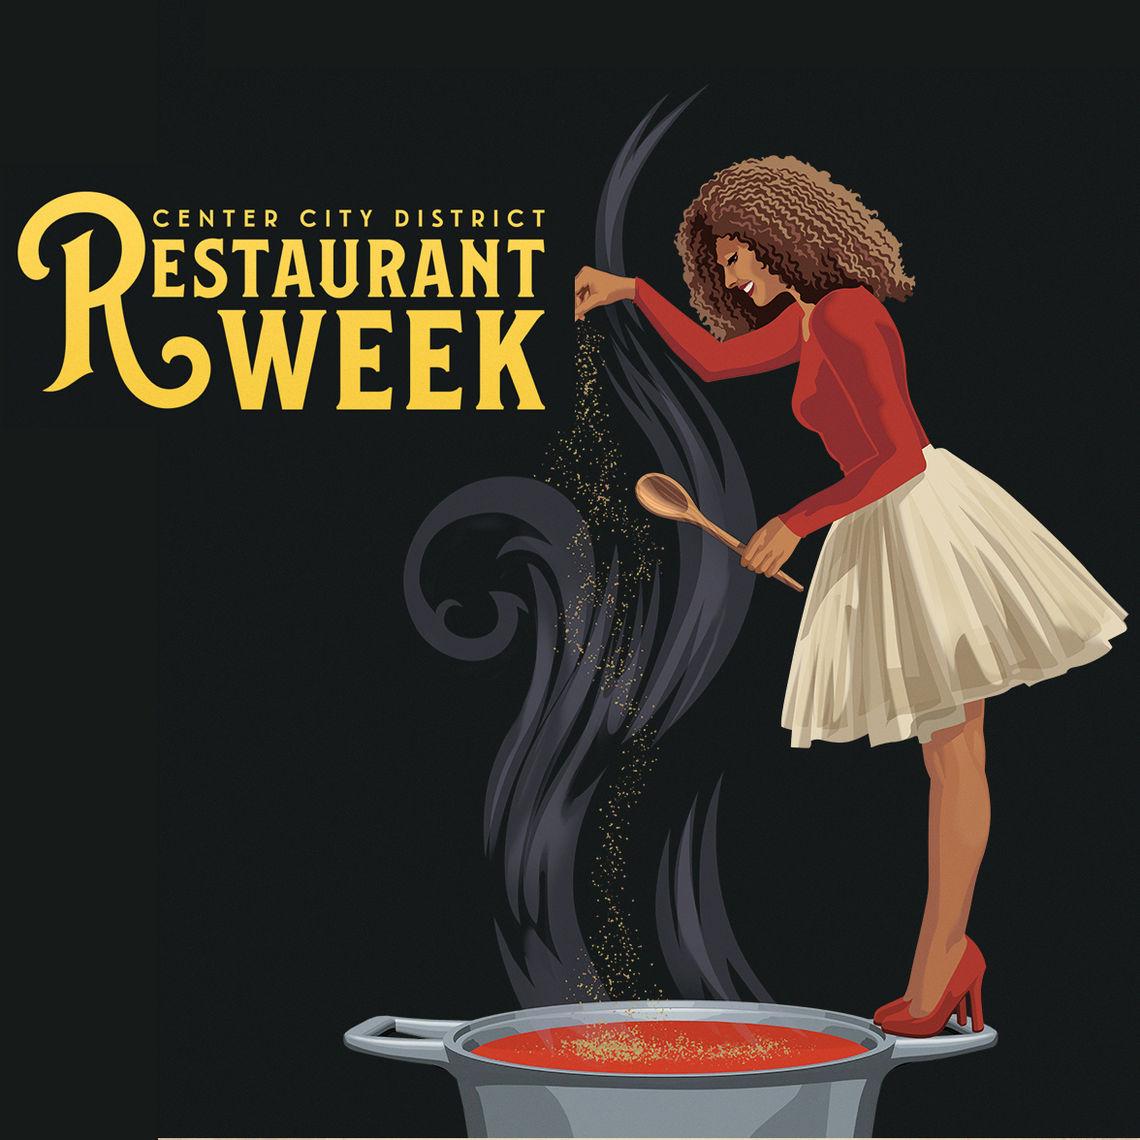 Cjpafaeqr0qc1pnqdci980tiu-restaurantweek-winter2018